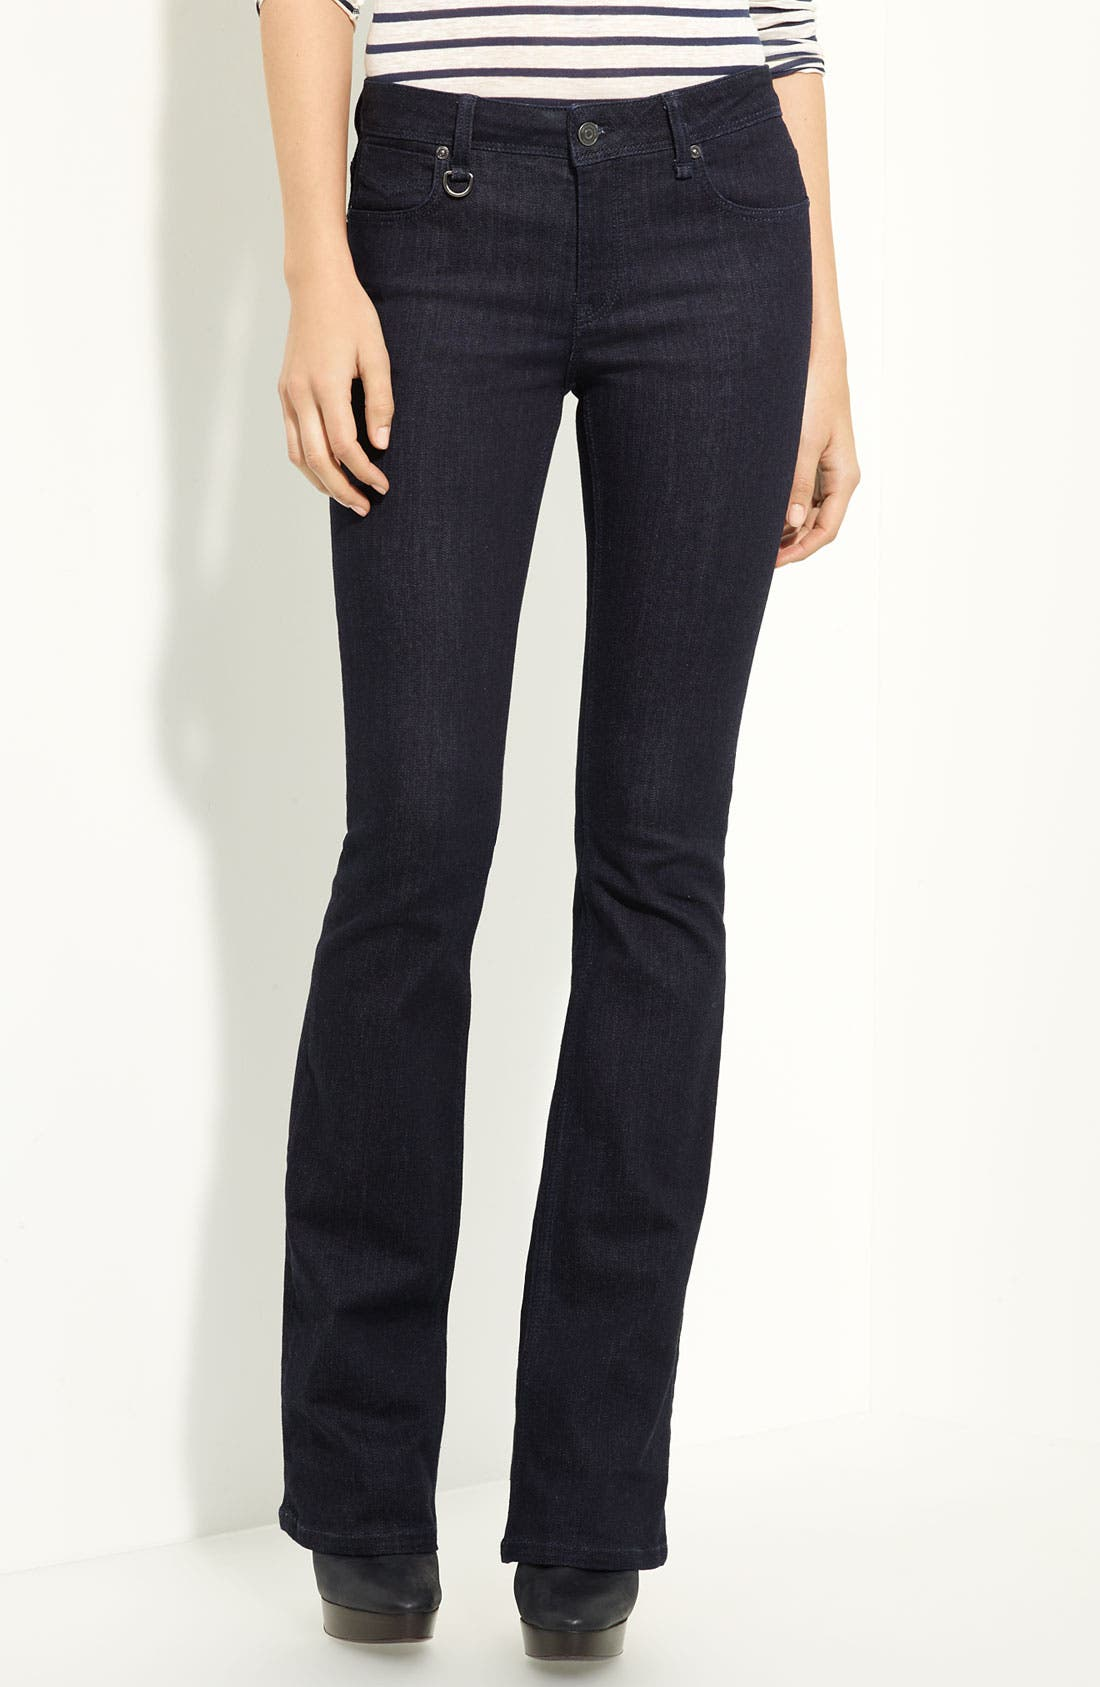 Main Image - Burberry Brit 5-Pocket Jeans